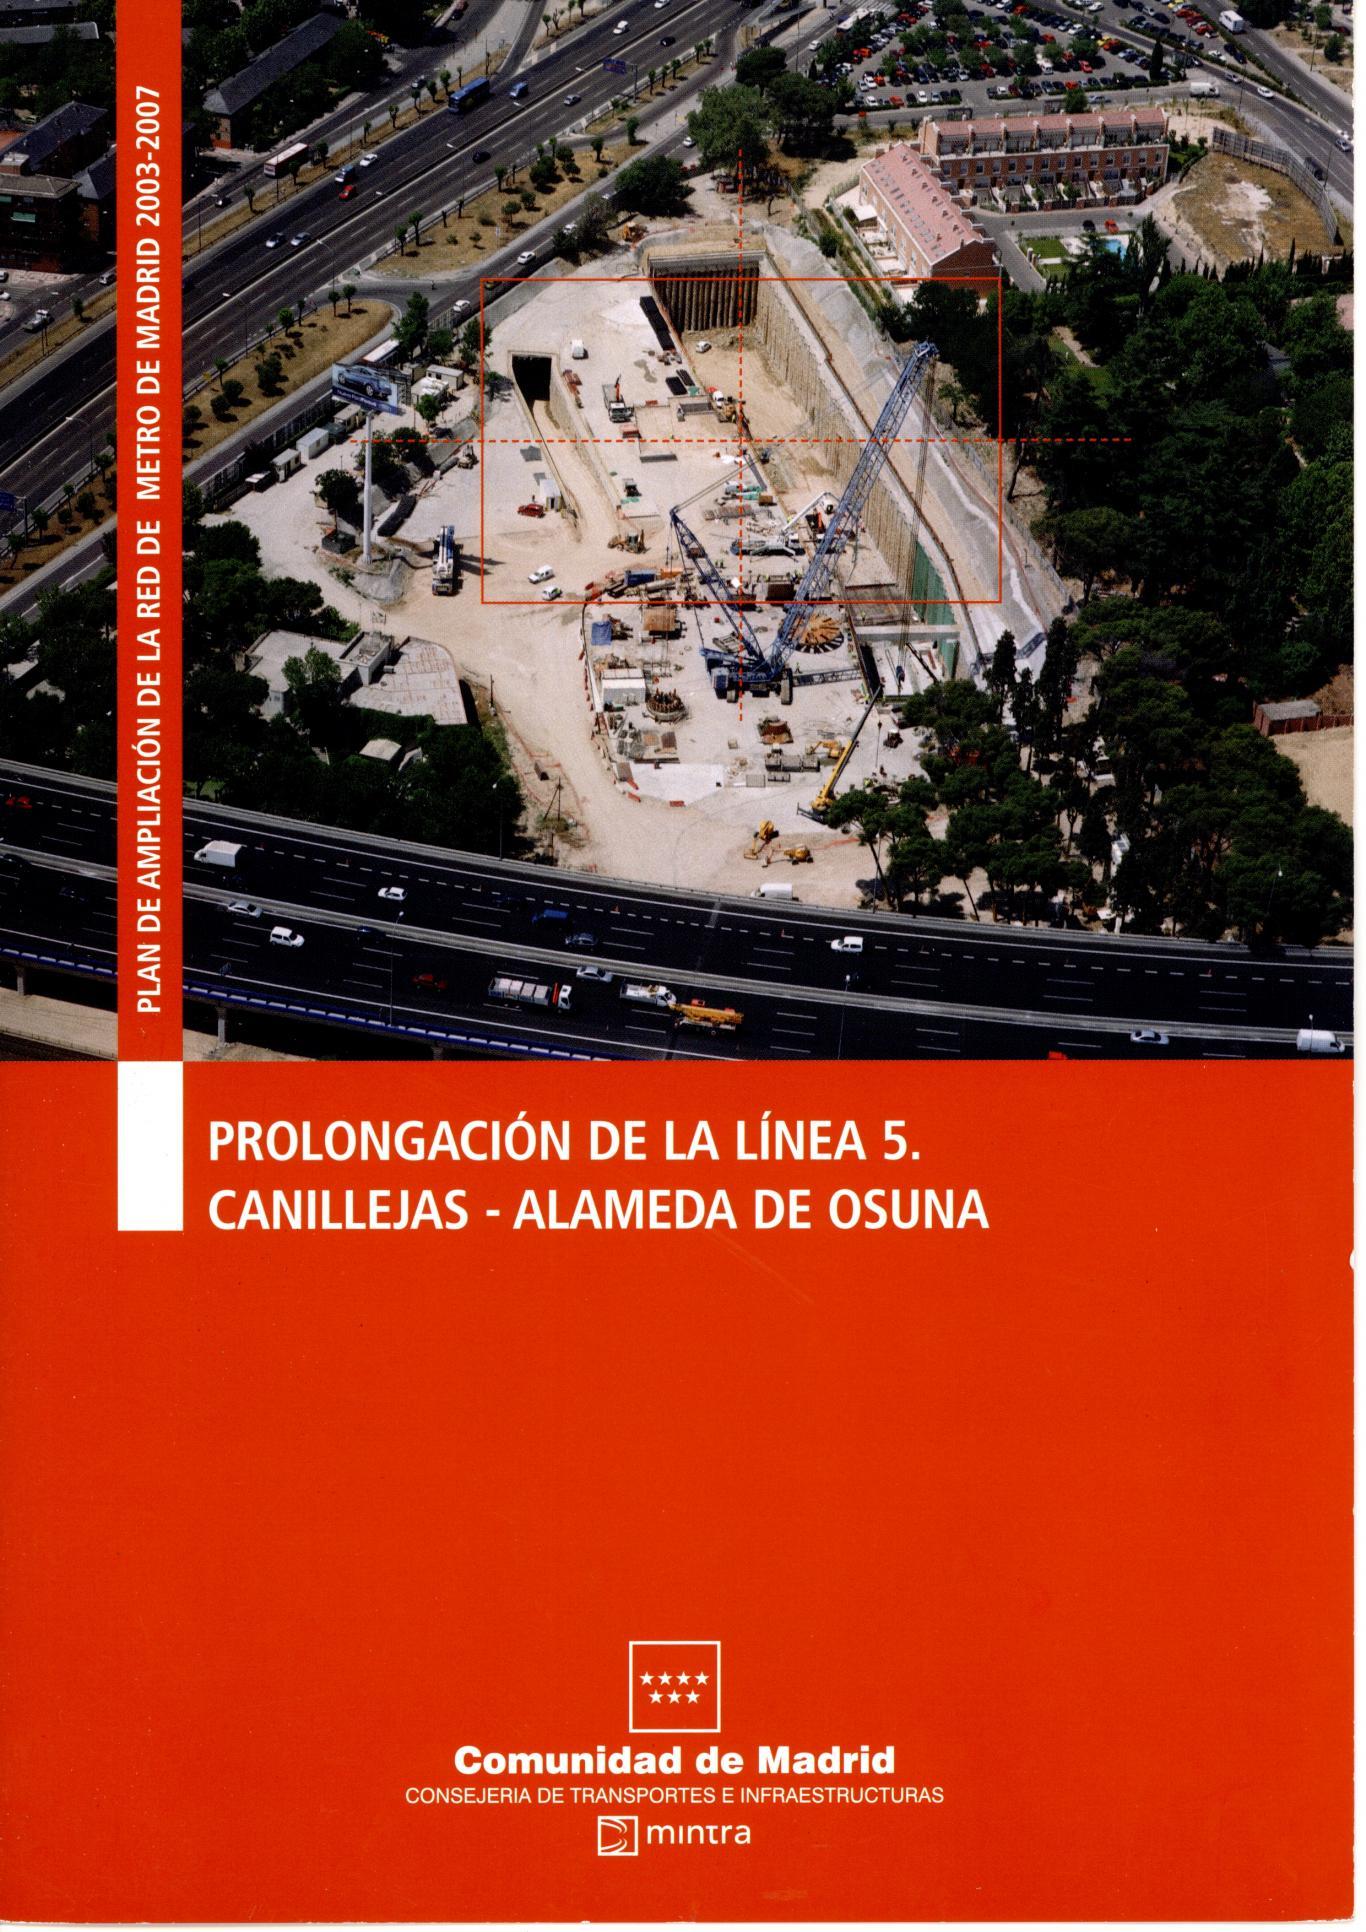 Carátula folleto L5 Canillejas-Alameda Osuna